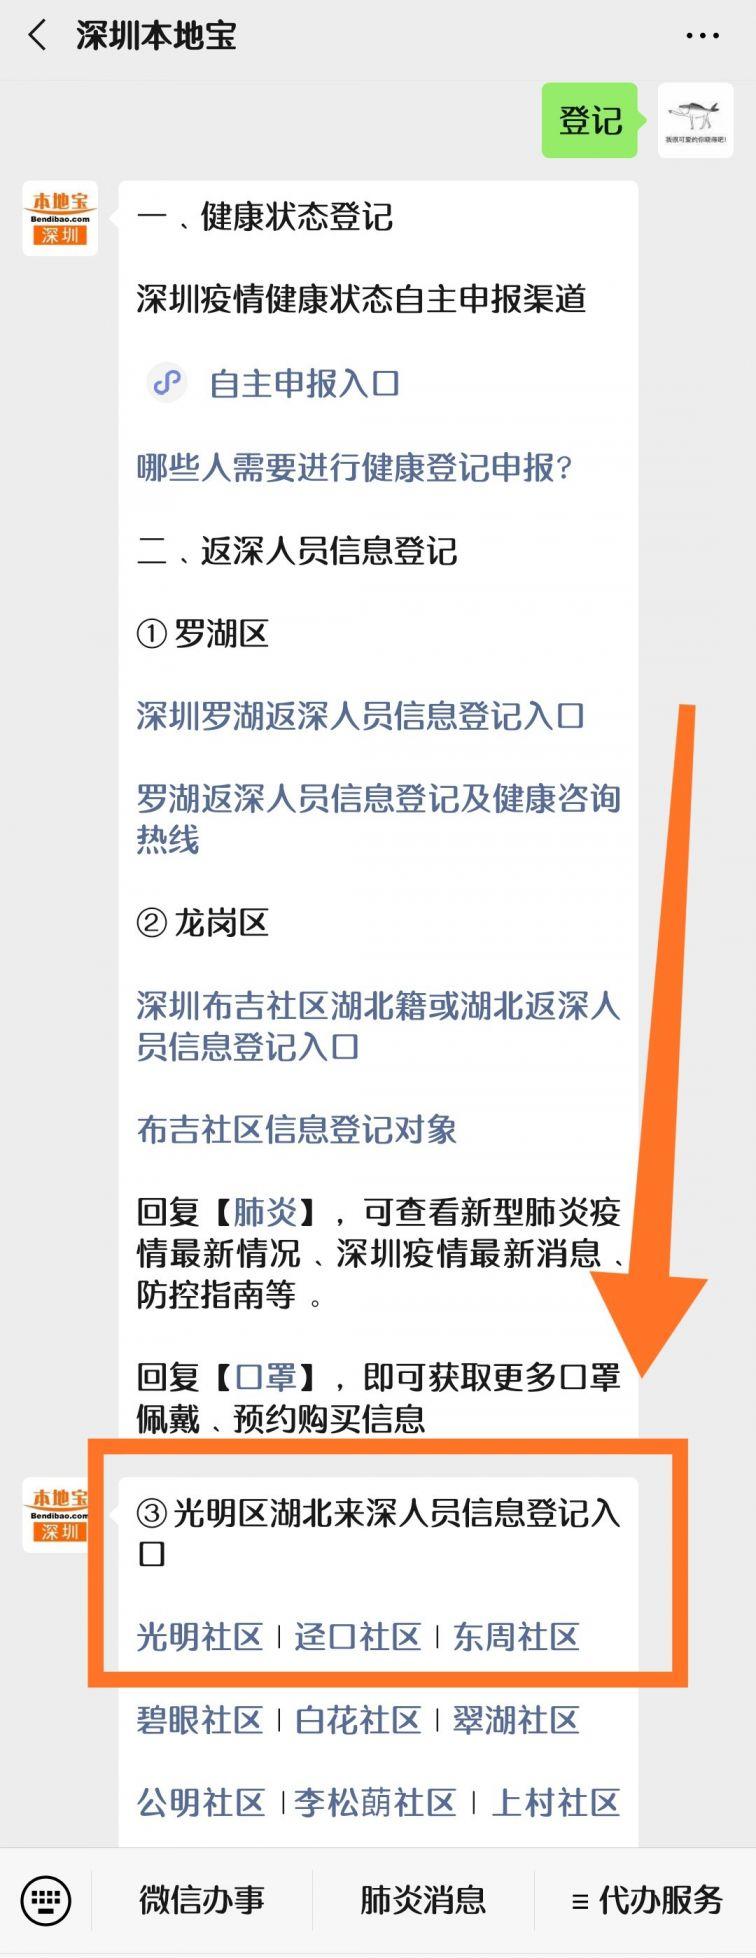 http://www.szminfu.com/shenzhenjingji/39986.html